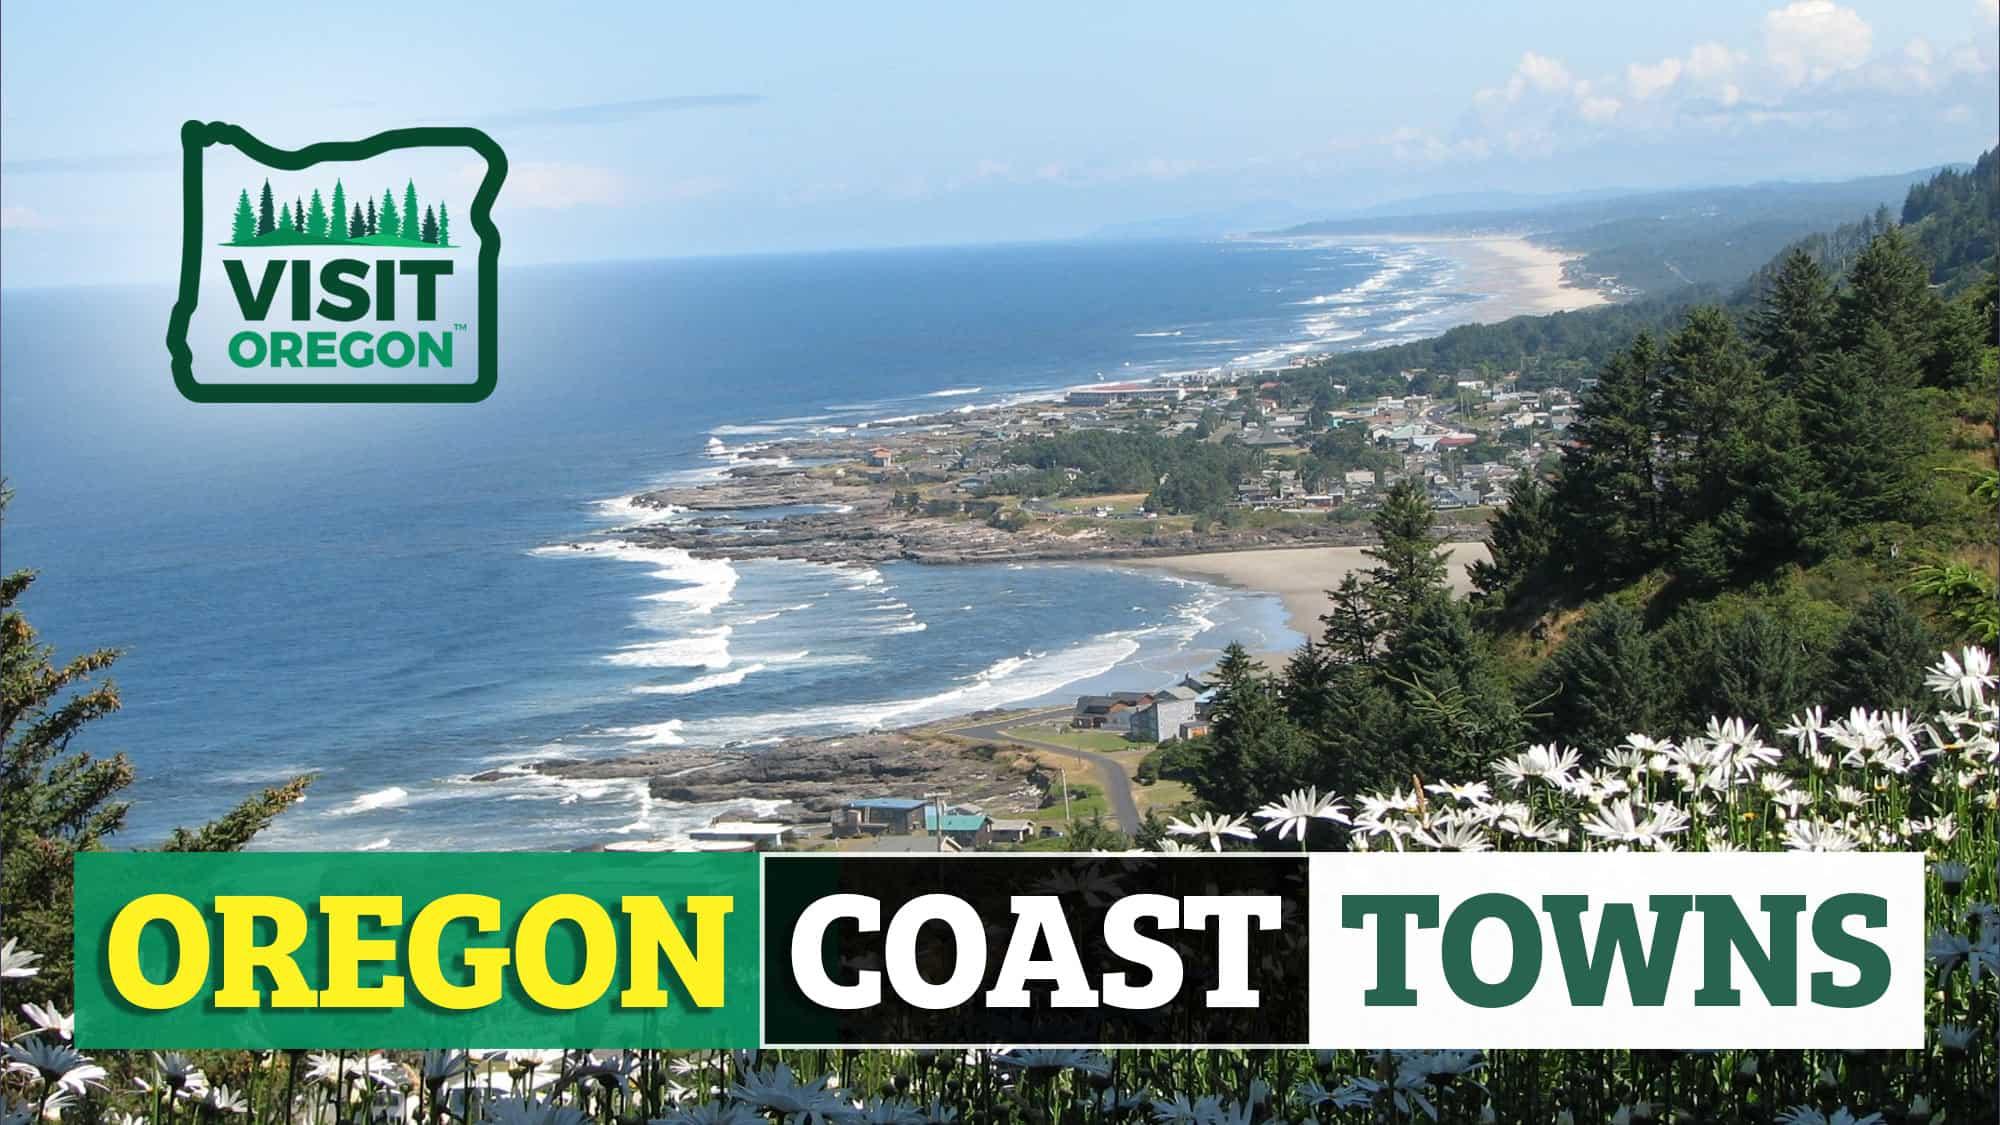 Oregon Coast Towns